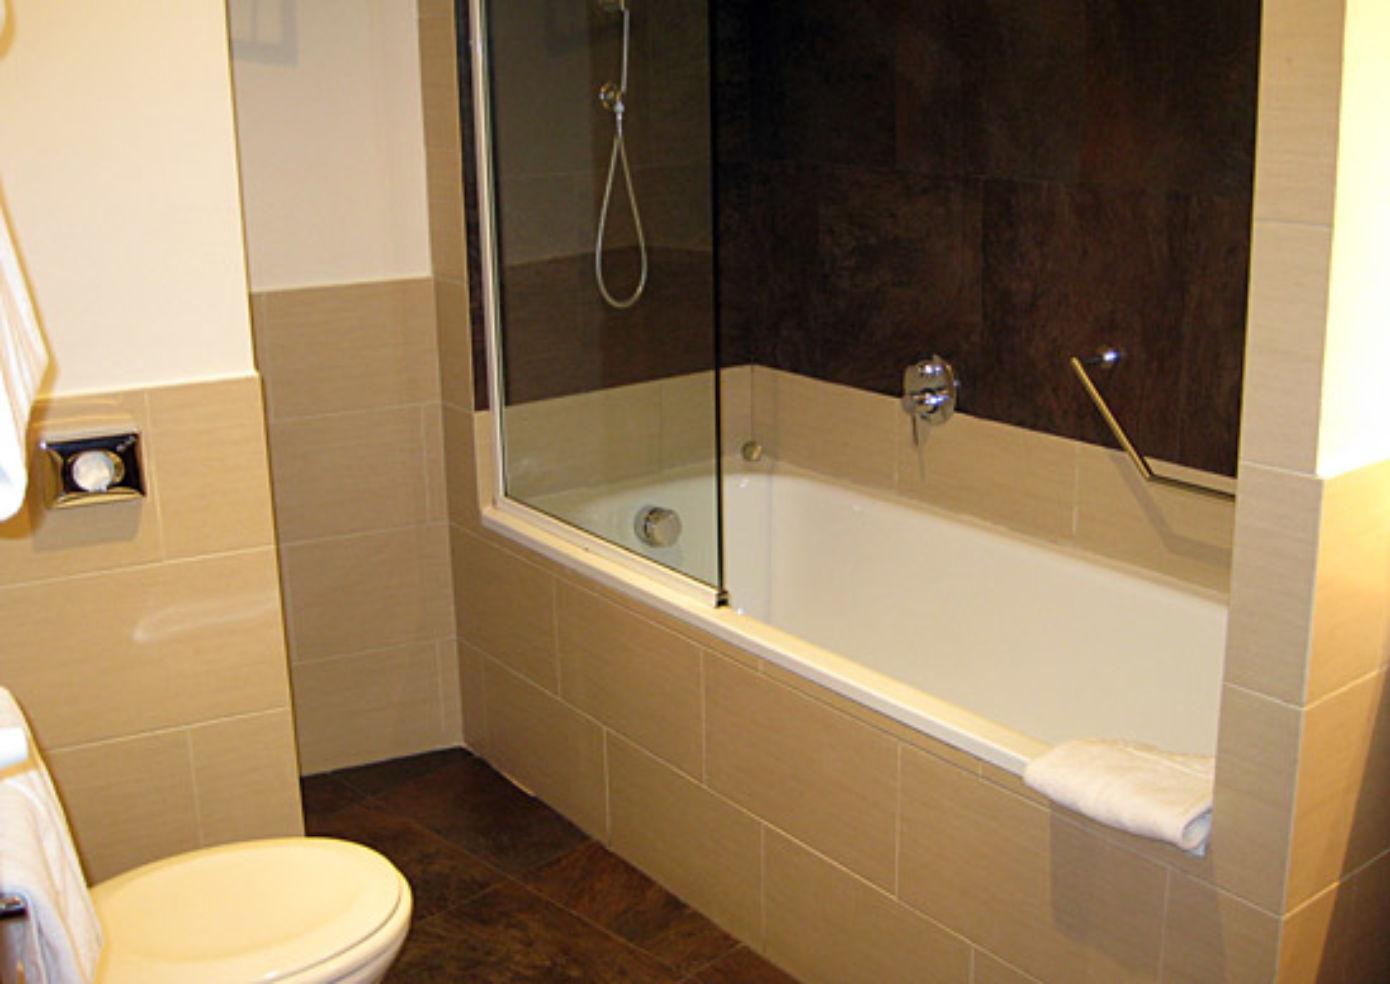 Half the rooms at Hotel Re di Roma have tubs big enough for a long soak.